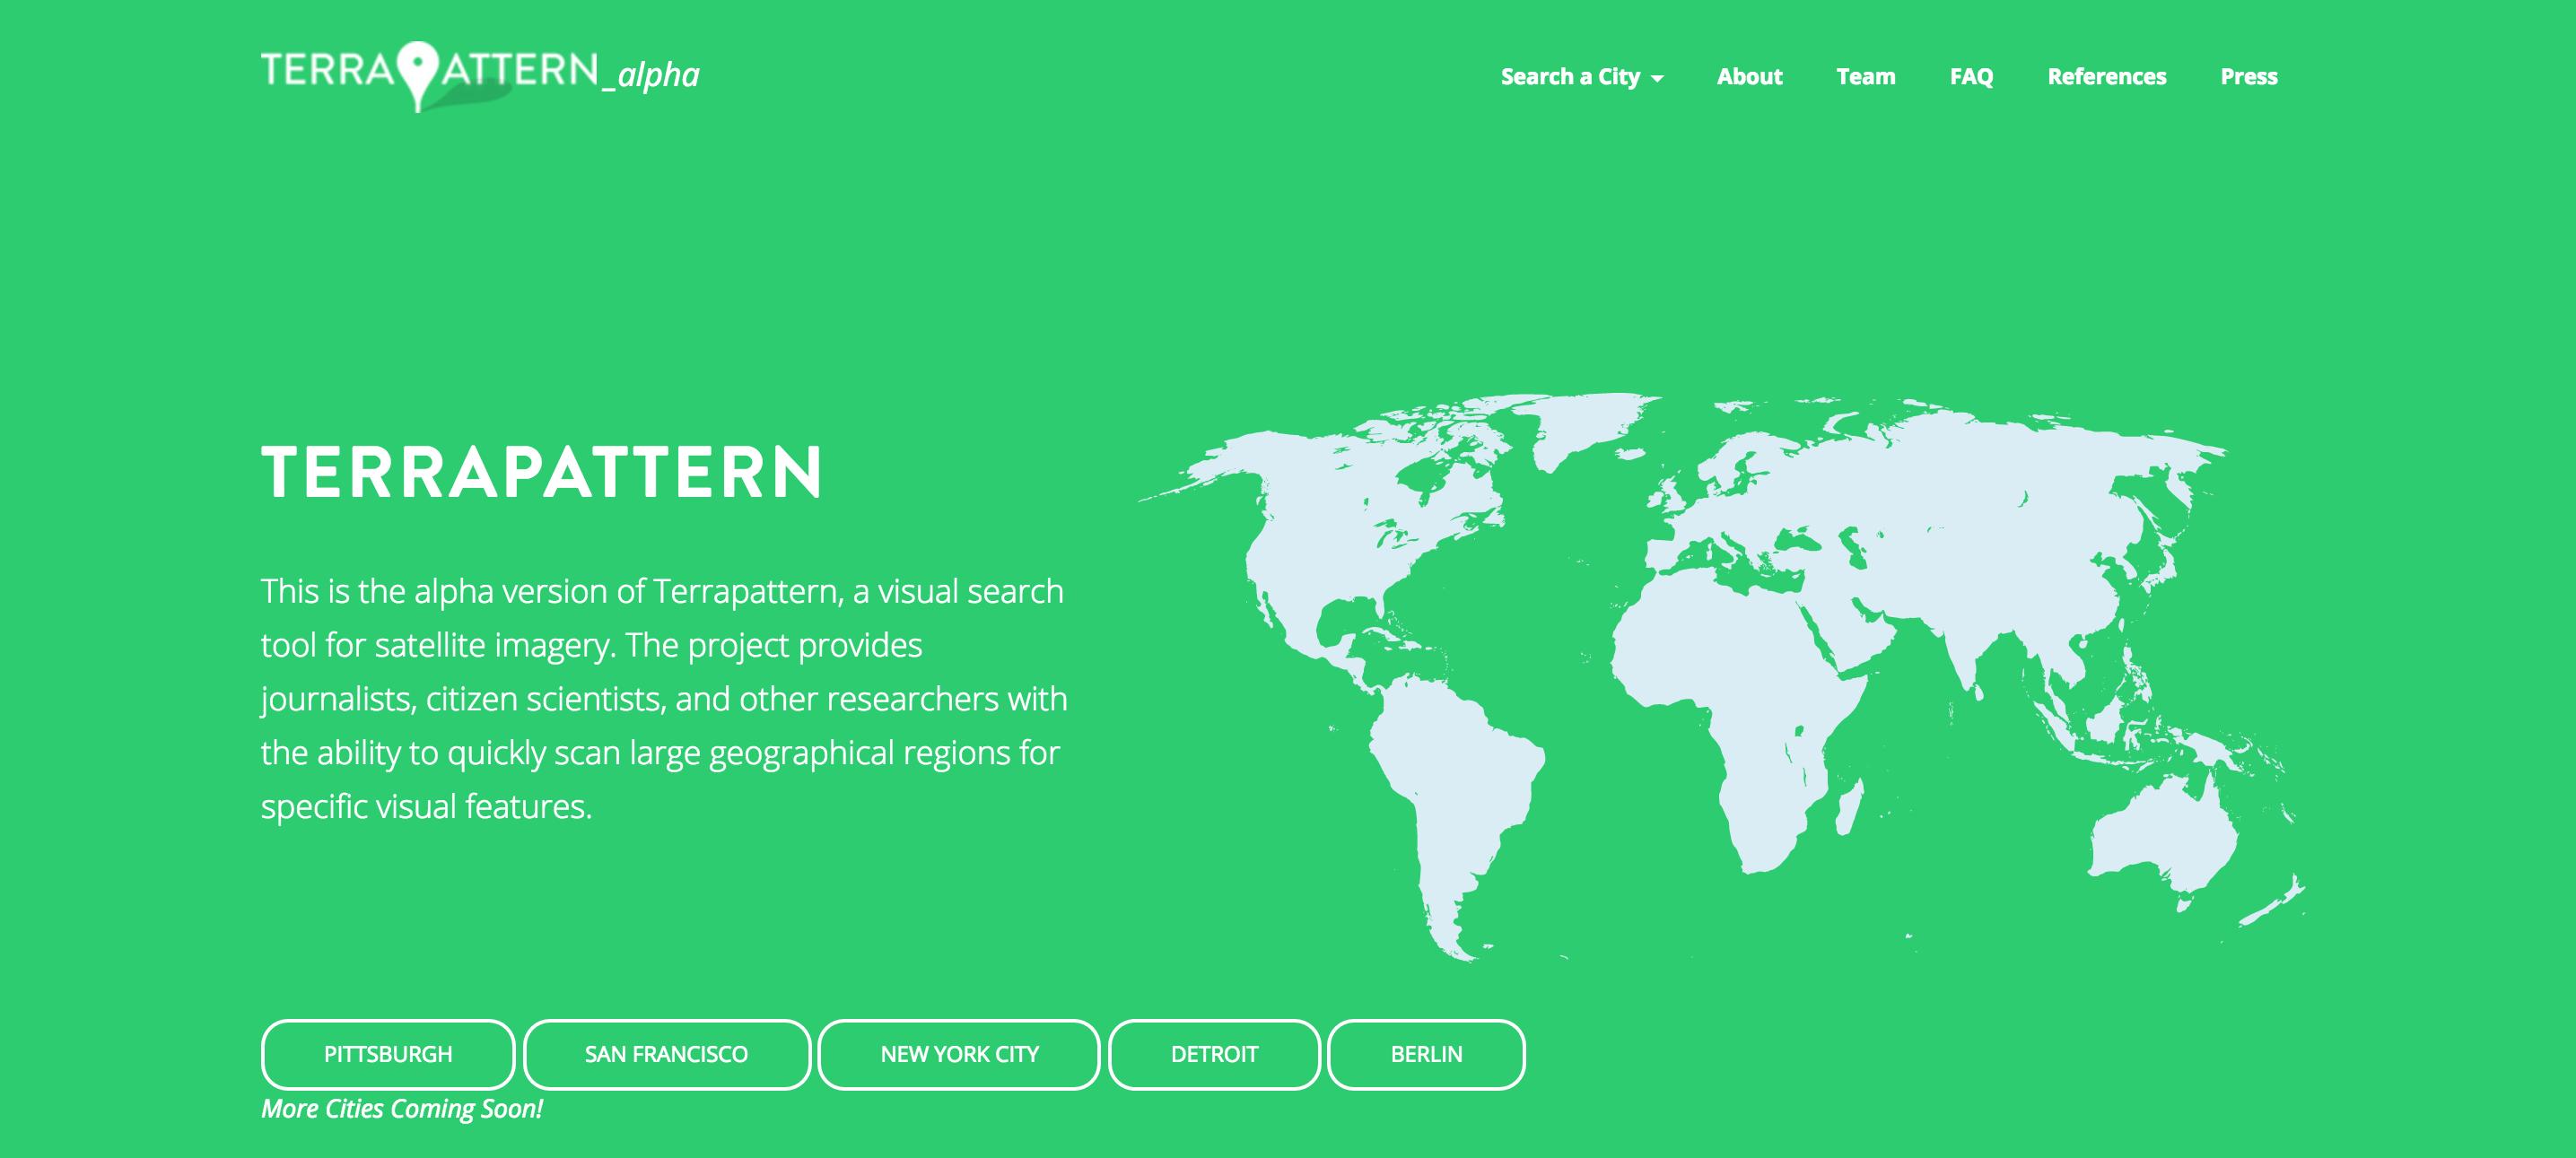 Terrapattern, il motore di ricerca per immagini satellitari